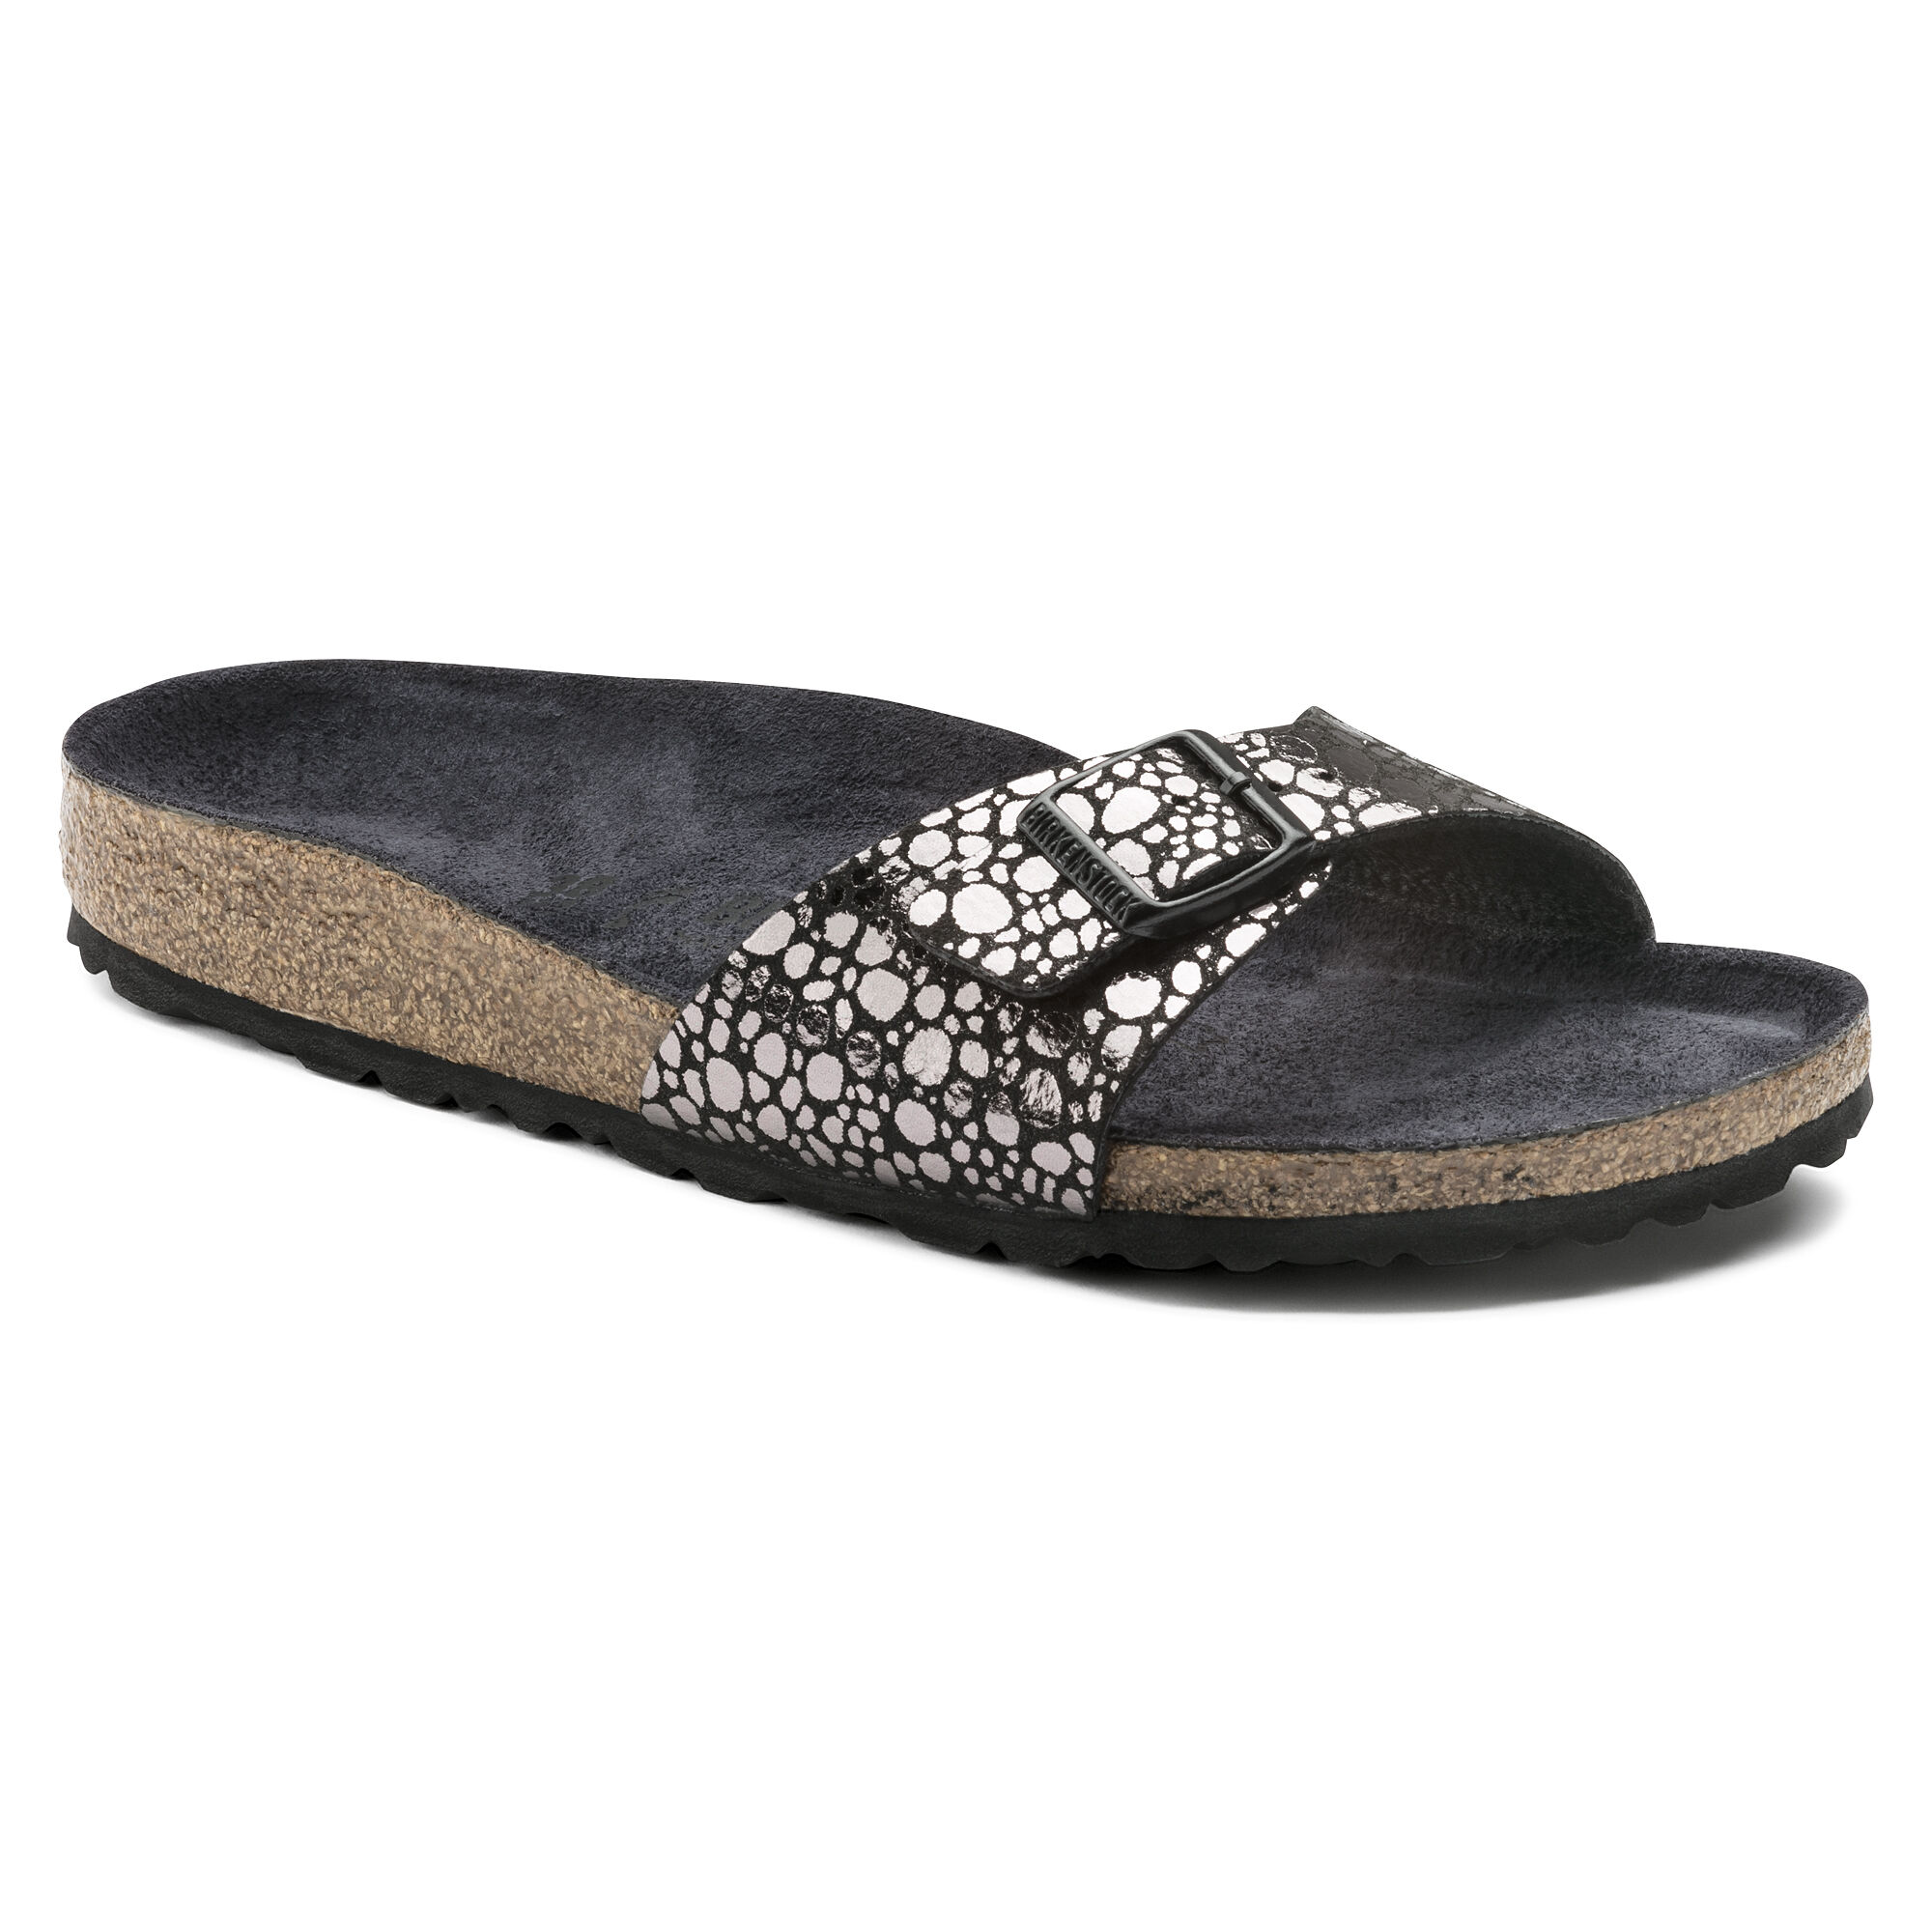 Birkenstock Arizona Slim Soft Black Suede, Schuhe, Sandalen & Hausschuhe, Hausschuhe, Schwarz, Female, 35